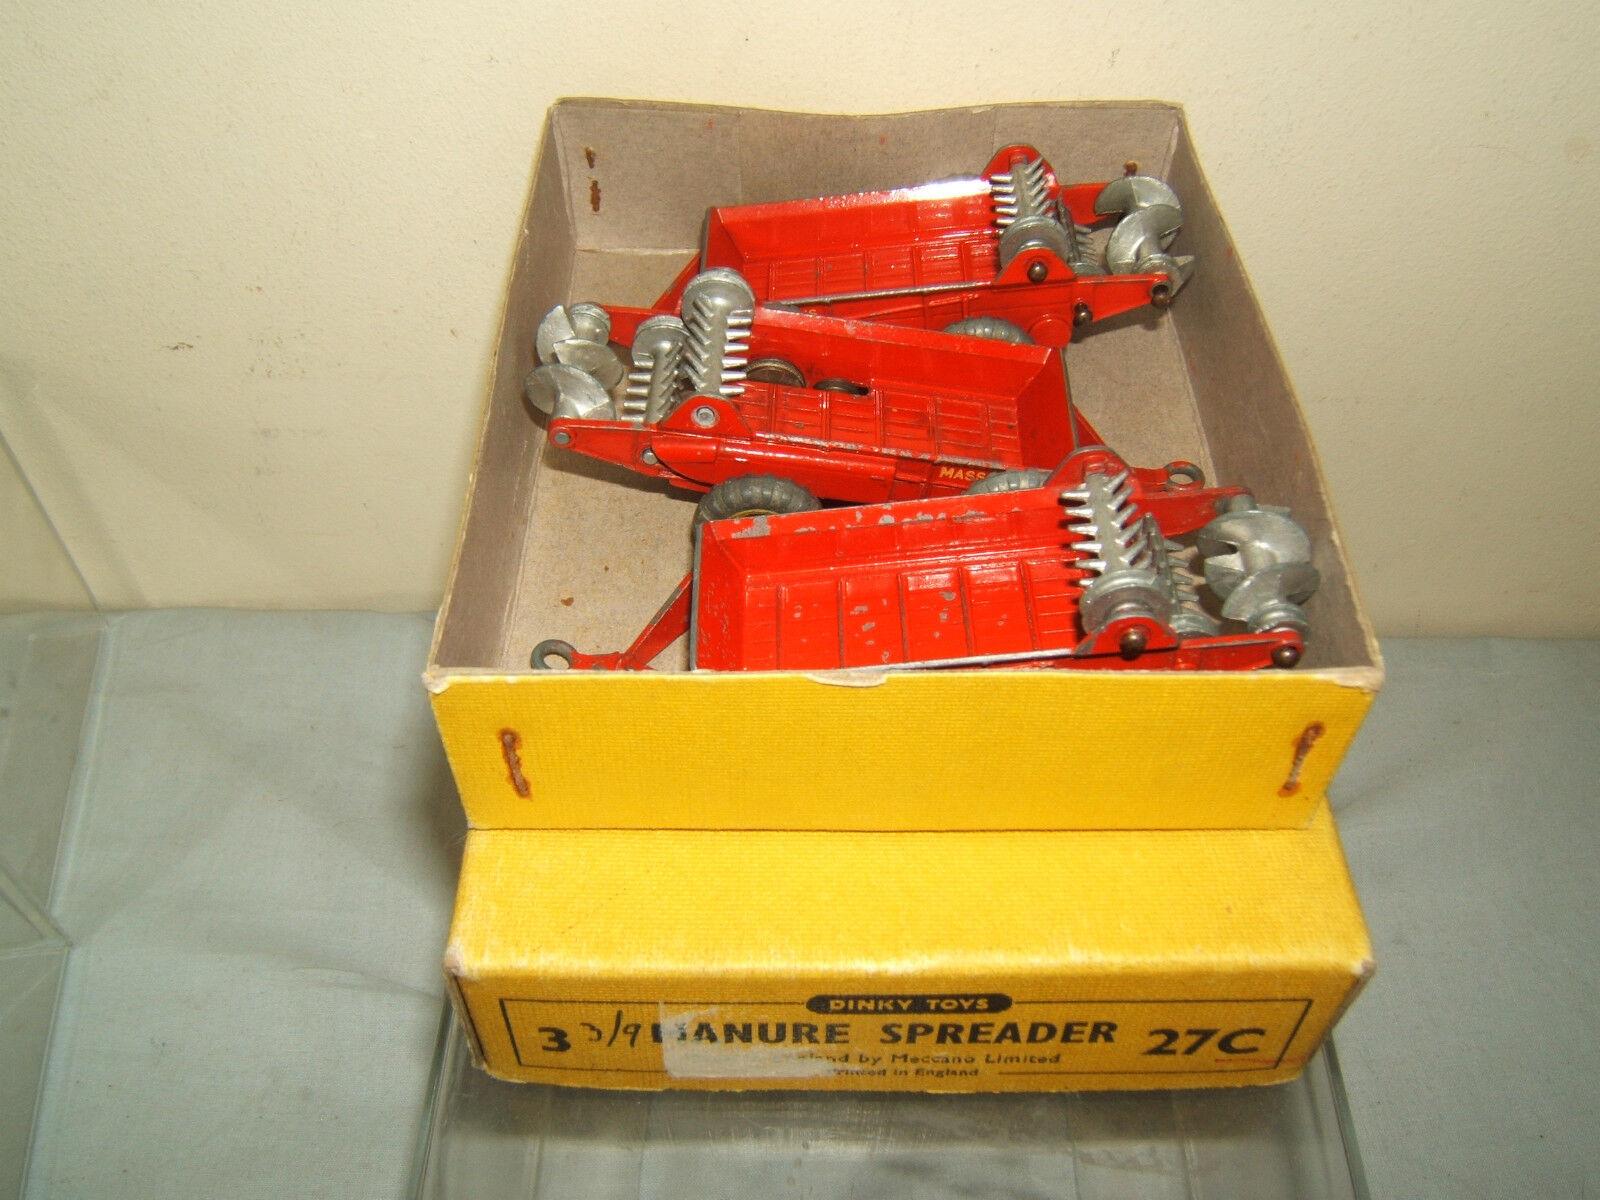 DINKY TOYS MODEL No.27c  3 x MANURE SPREADERS SPREADERS SPREADERS IN TRADE BOX a7166f